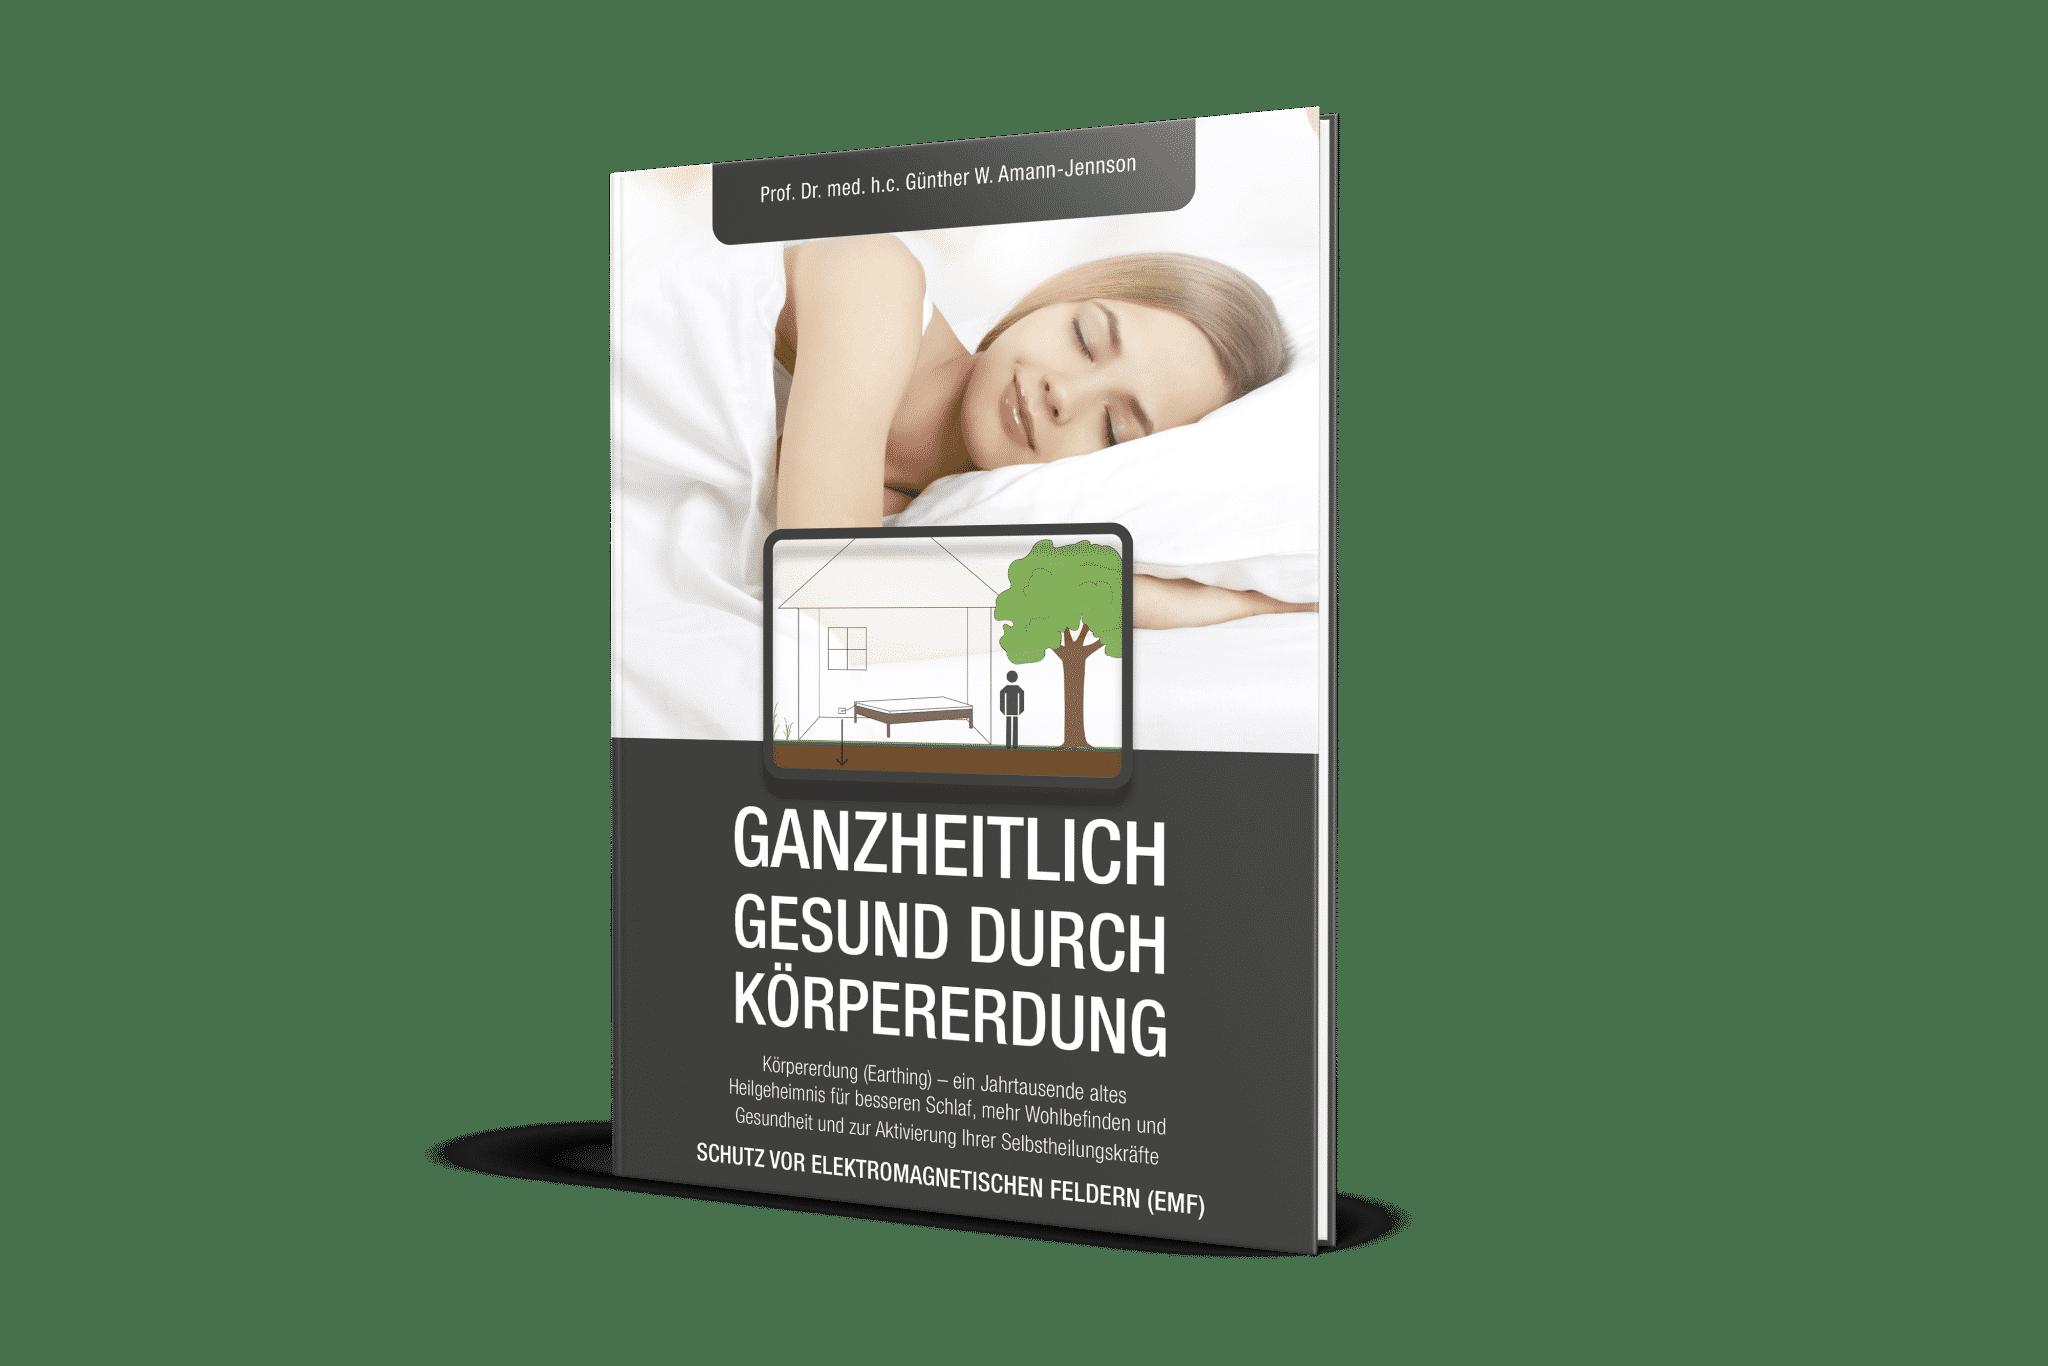 Ebook-Download: Schlafstörungen durch Körpererdung therapieren!